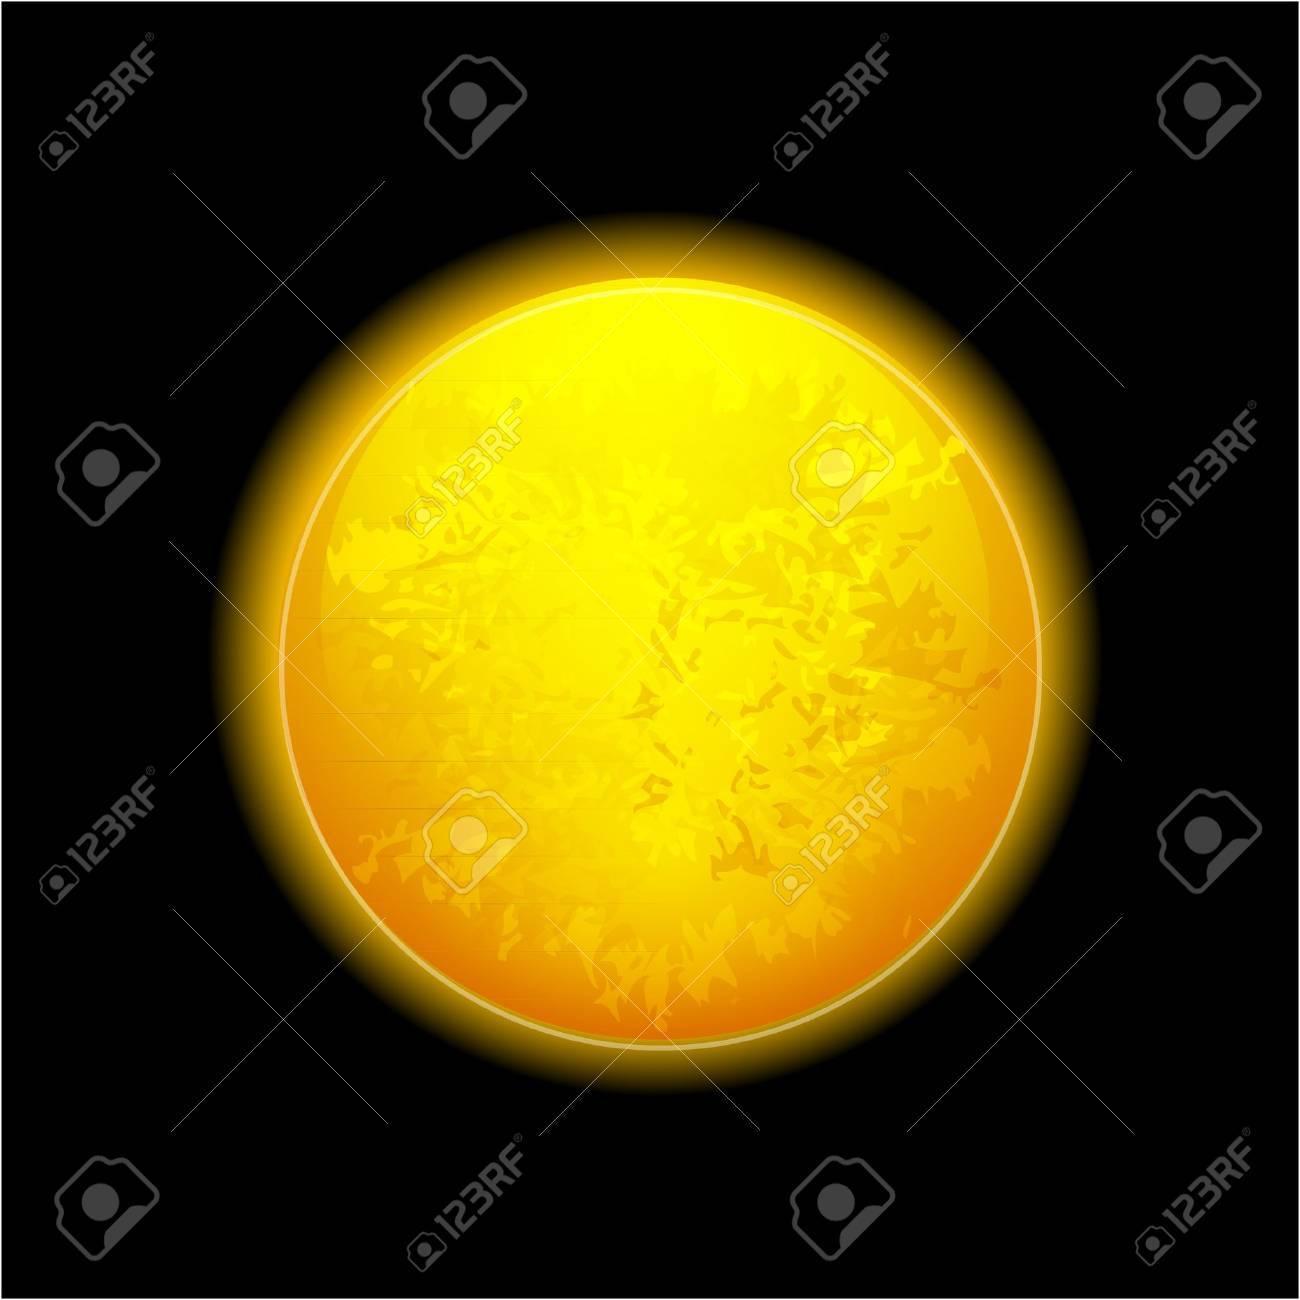 Realistic moon - 10491796